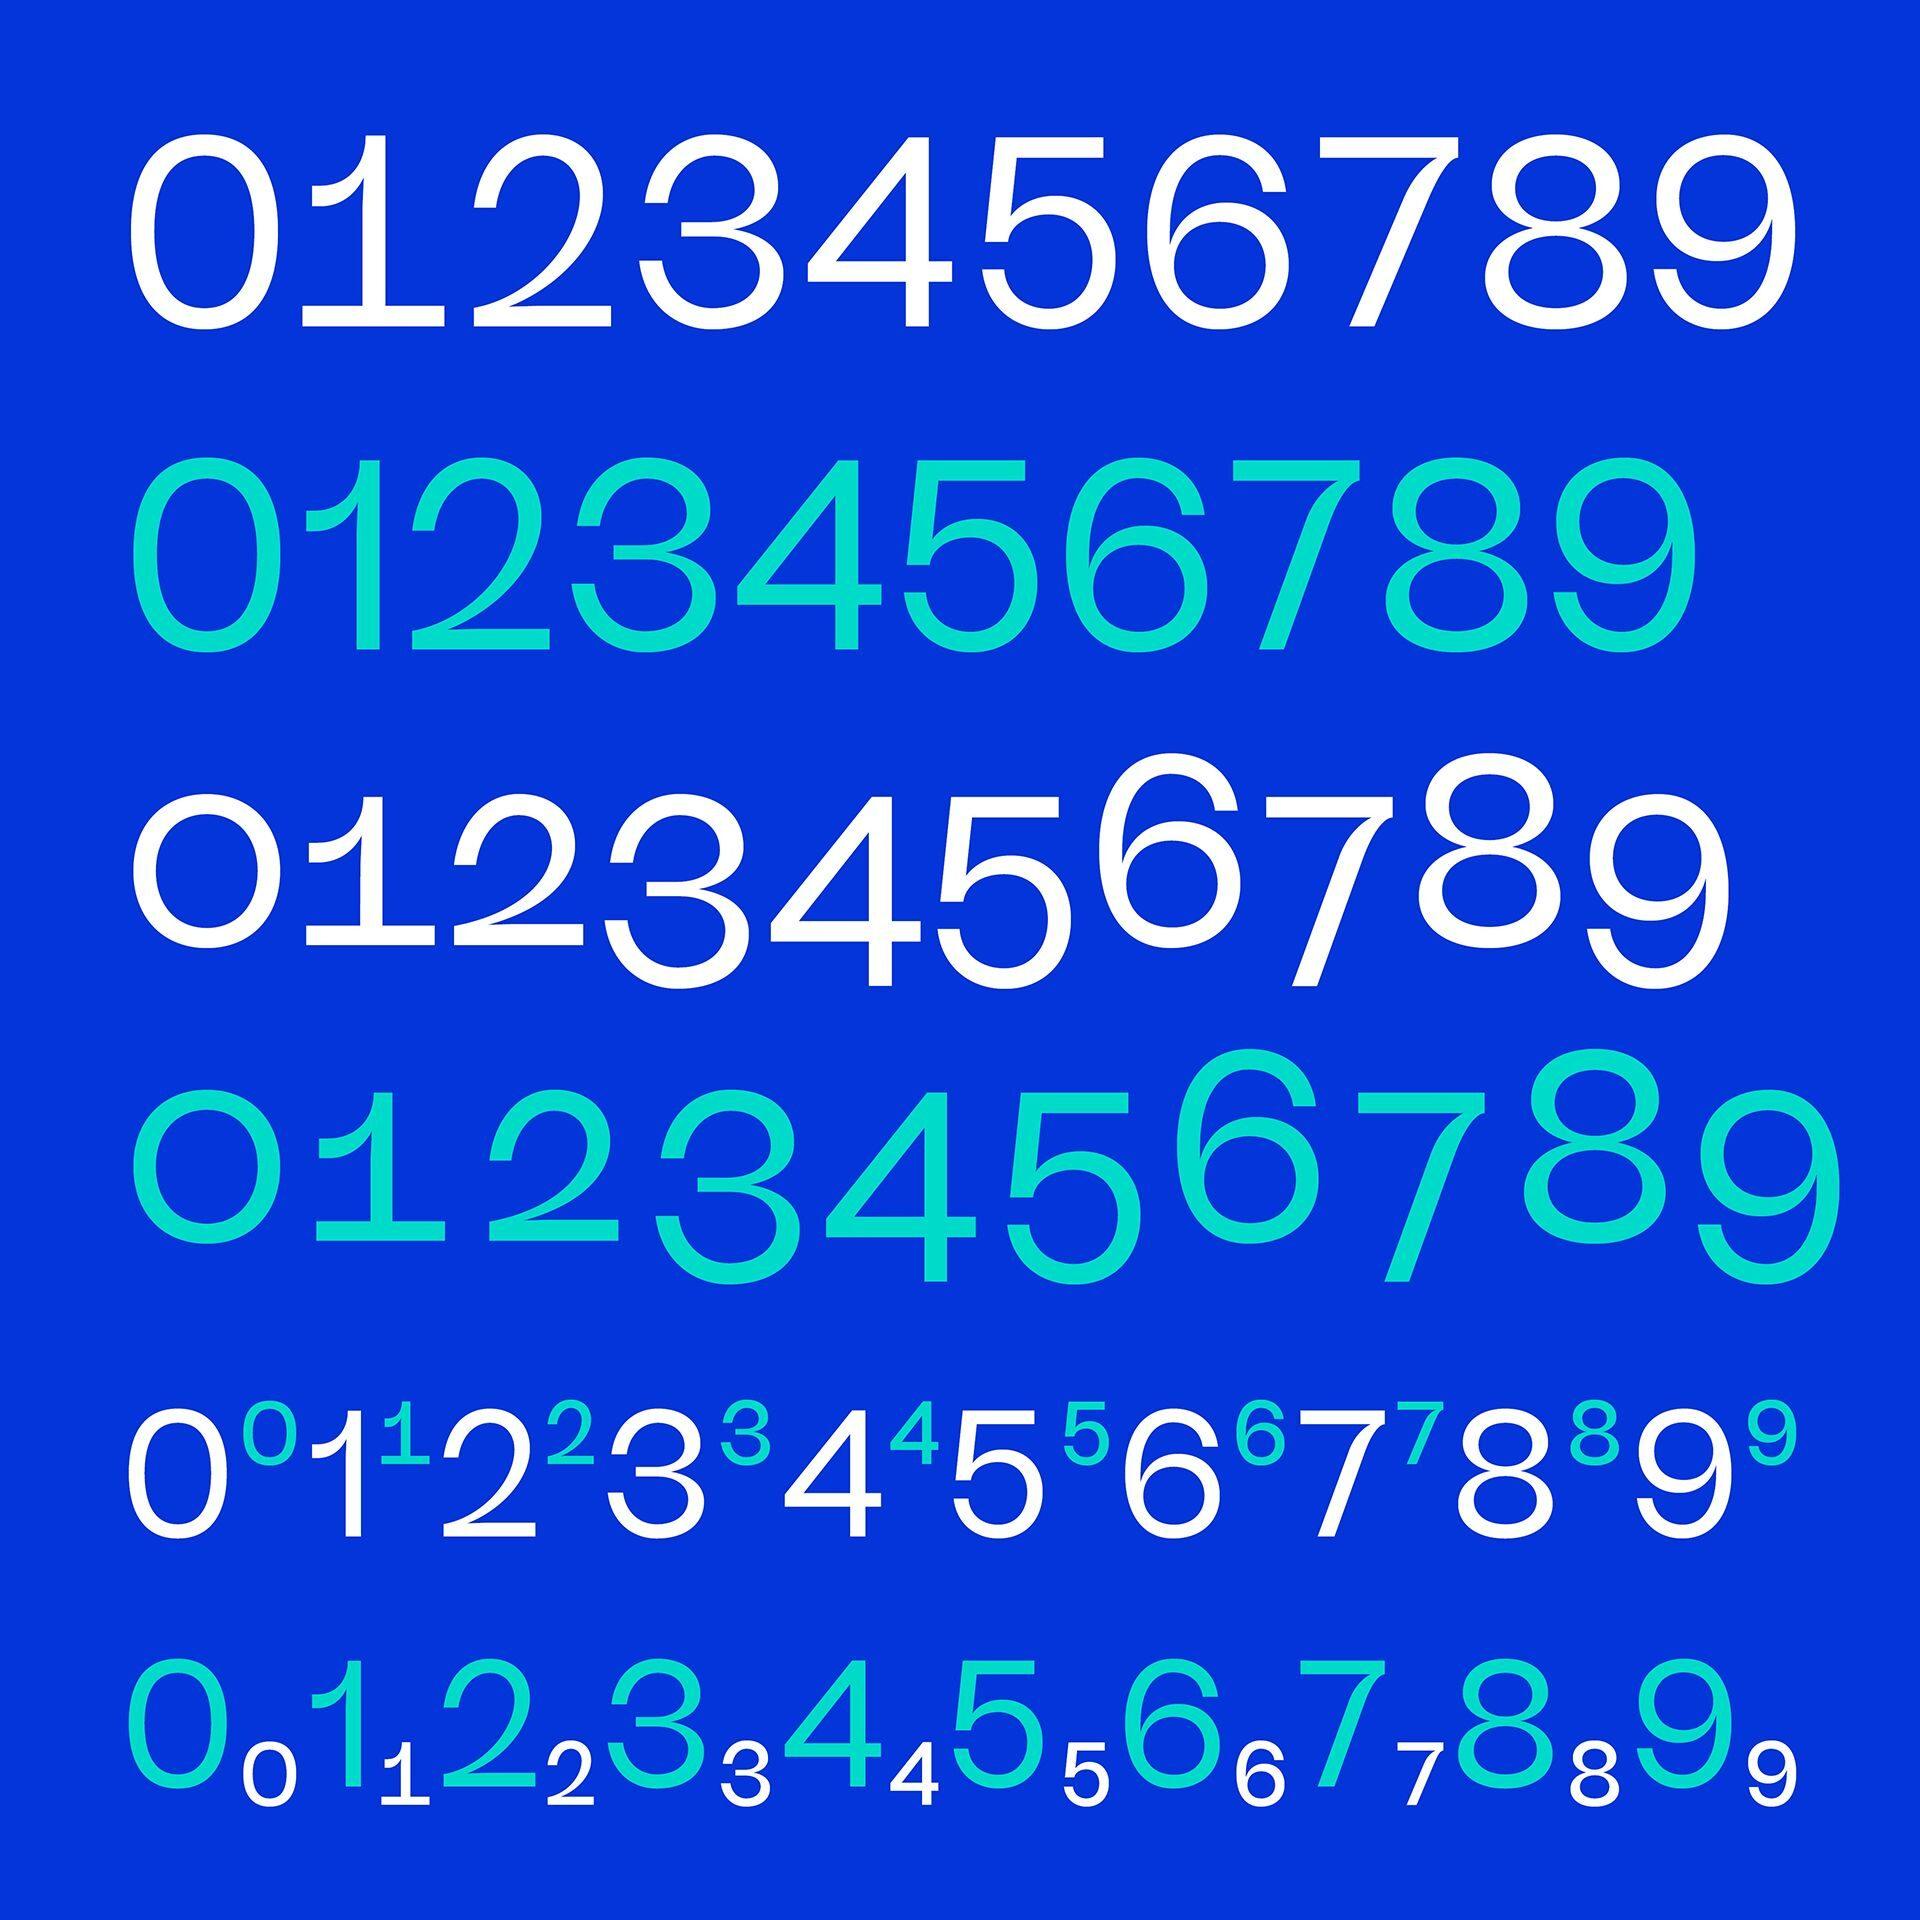 uivo numbers